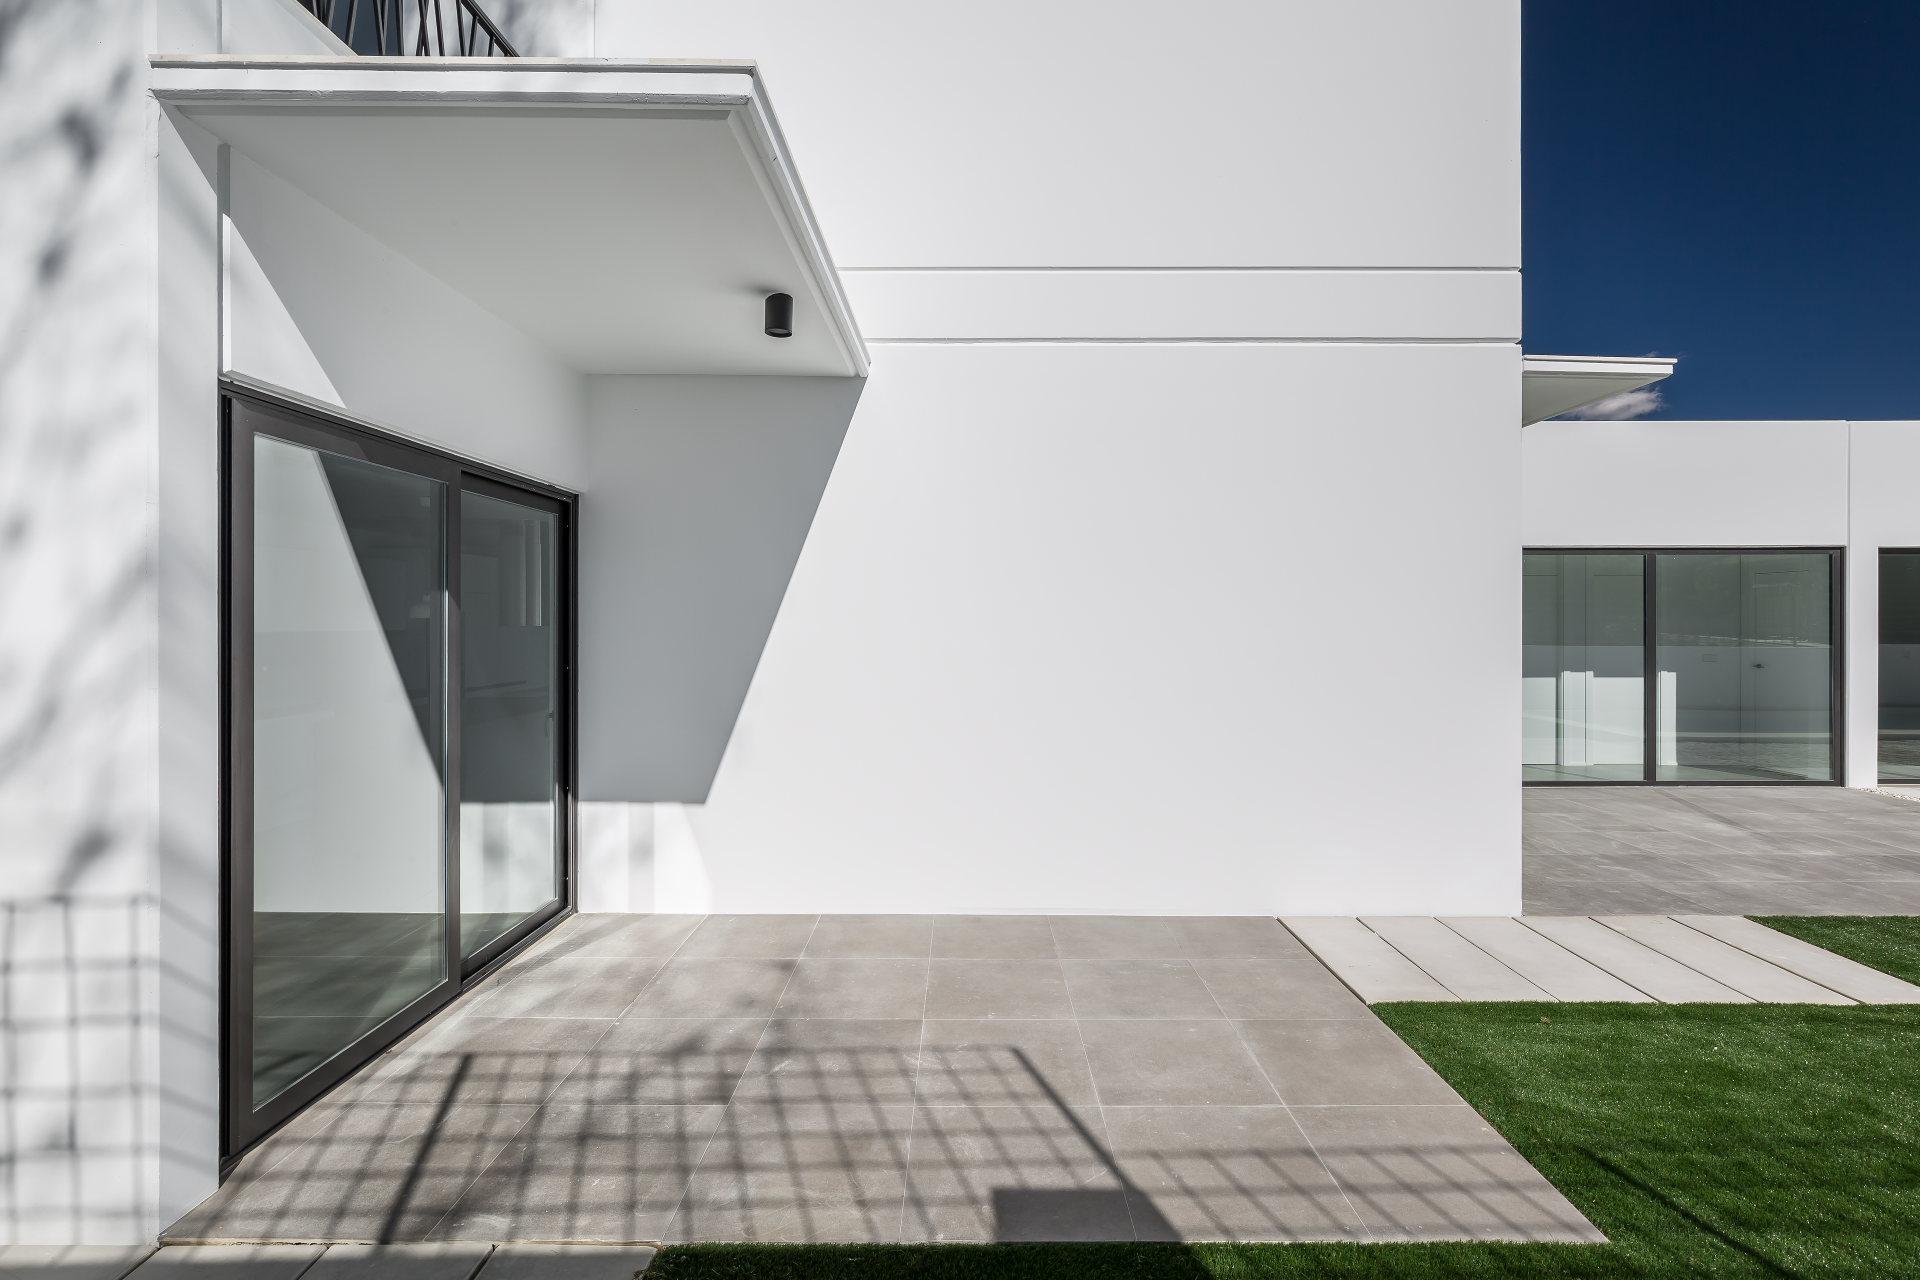 fotografia-arquitectura-valencia-german-cabo-viraje-el-vedat-torrent (7)